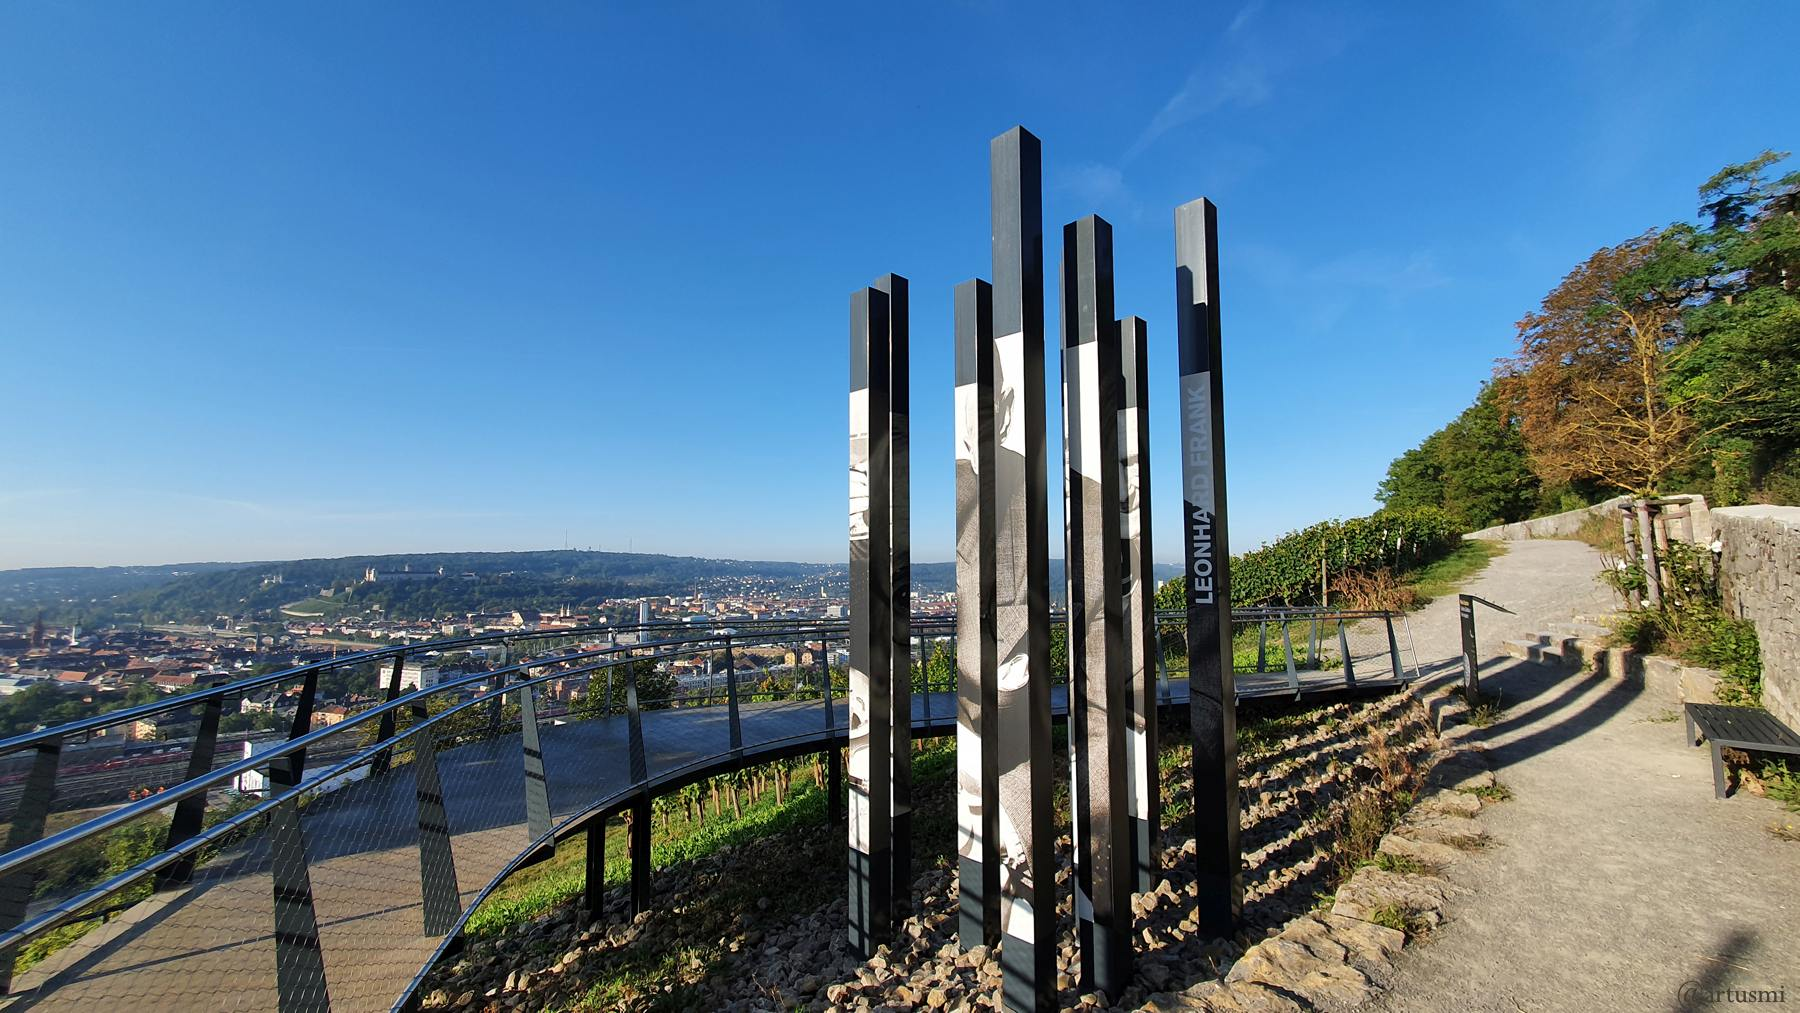 terroir f Würzburg am 23. September 2021